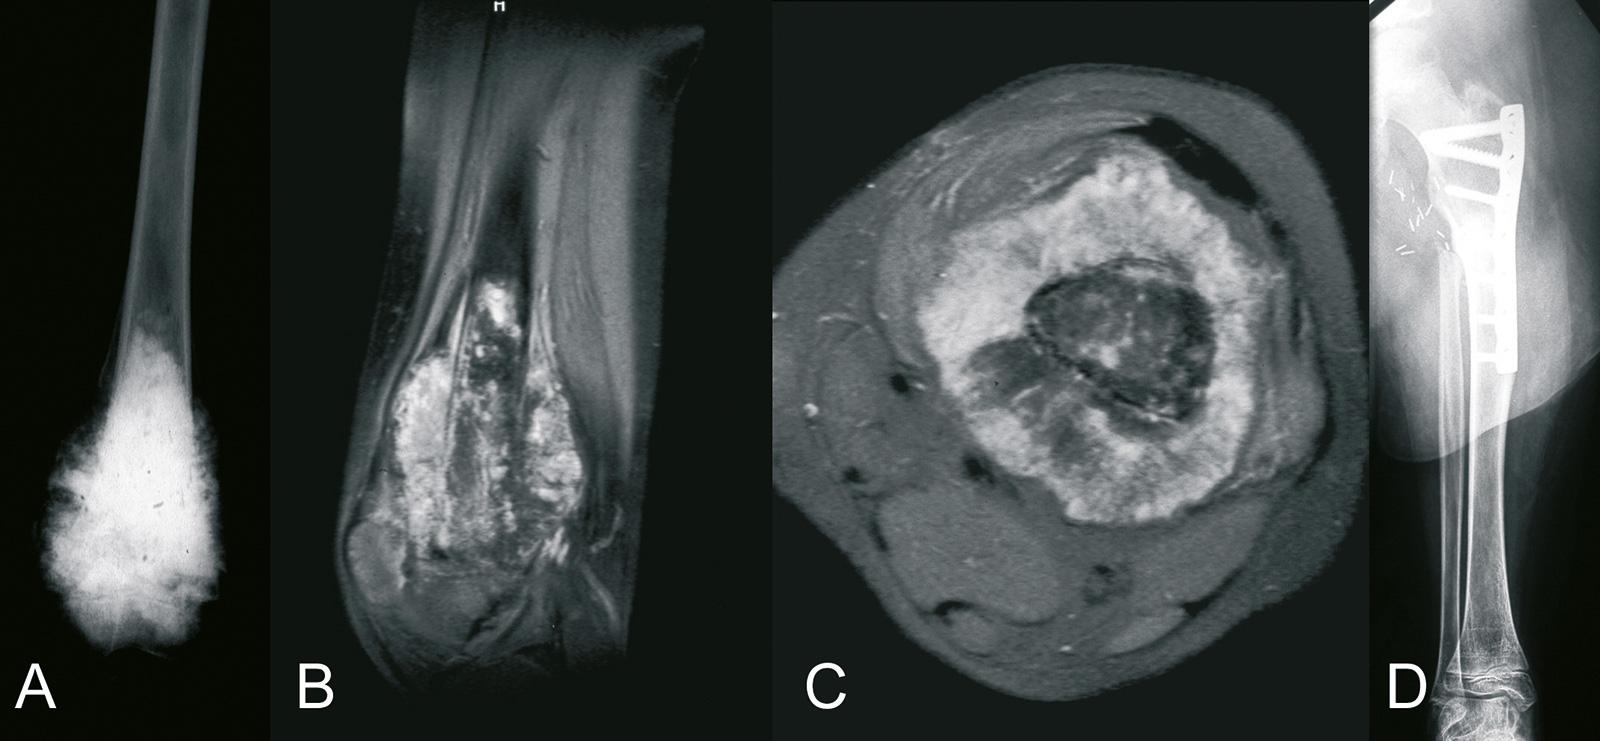 Abb. 8-12: Osteosarkom des distalen Femurs (A-C). Zustand nach einer A1-Umdrehplastik (D)